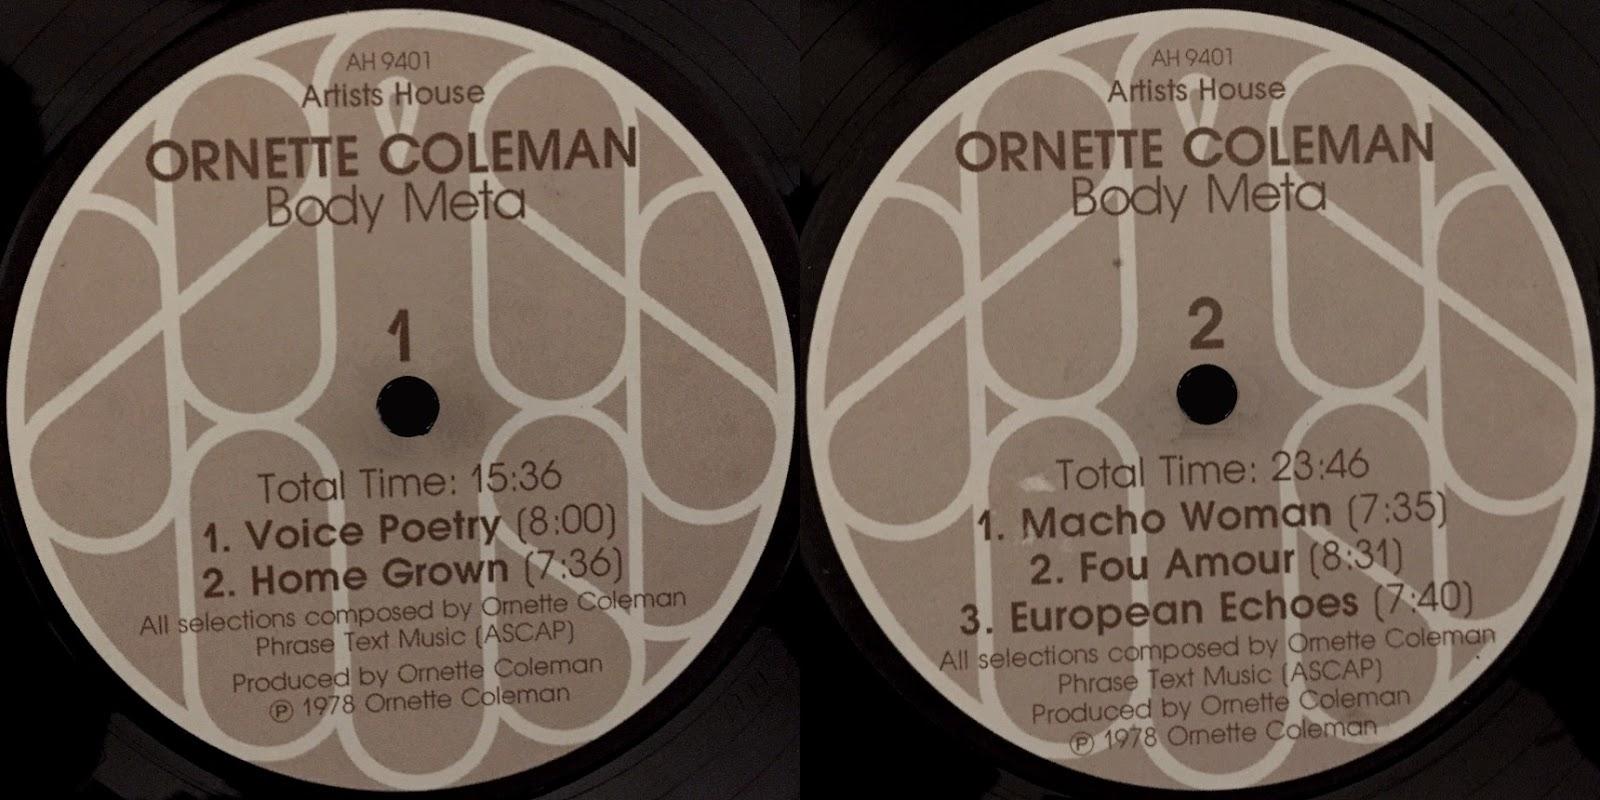 Ornette Coleman Body Meta